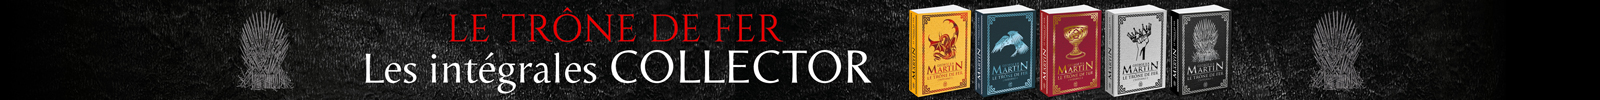 Bandeau Novembre 2019 - Trone de Fer Collector